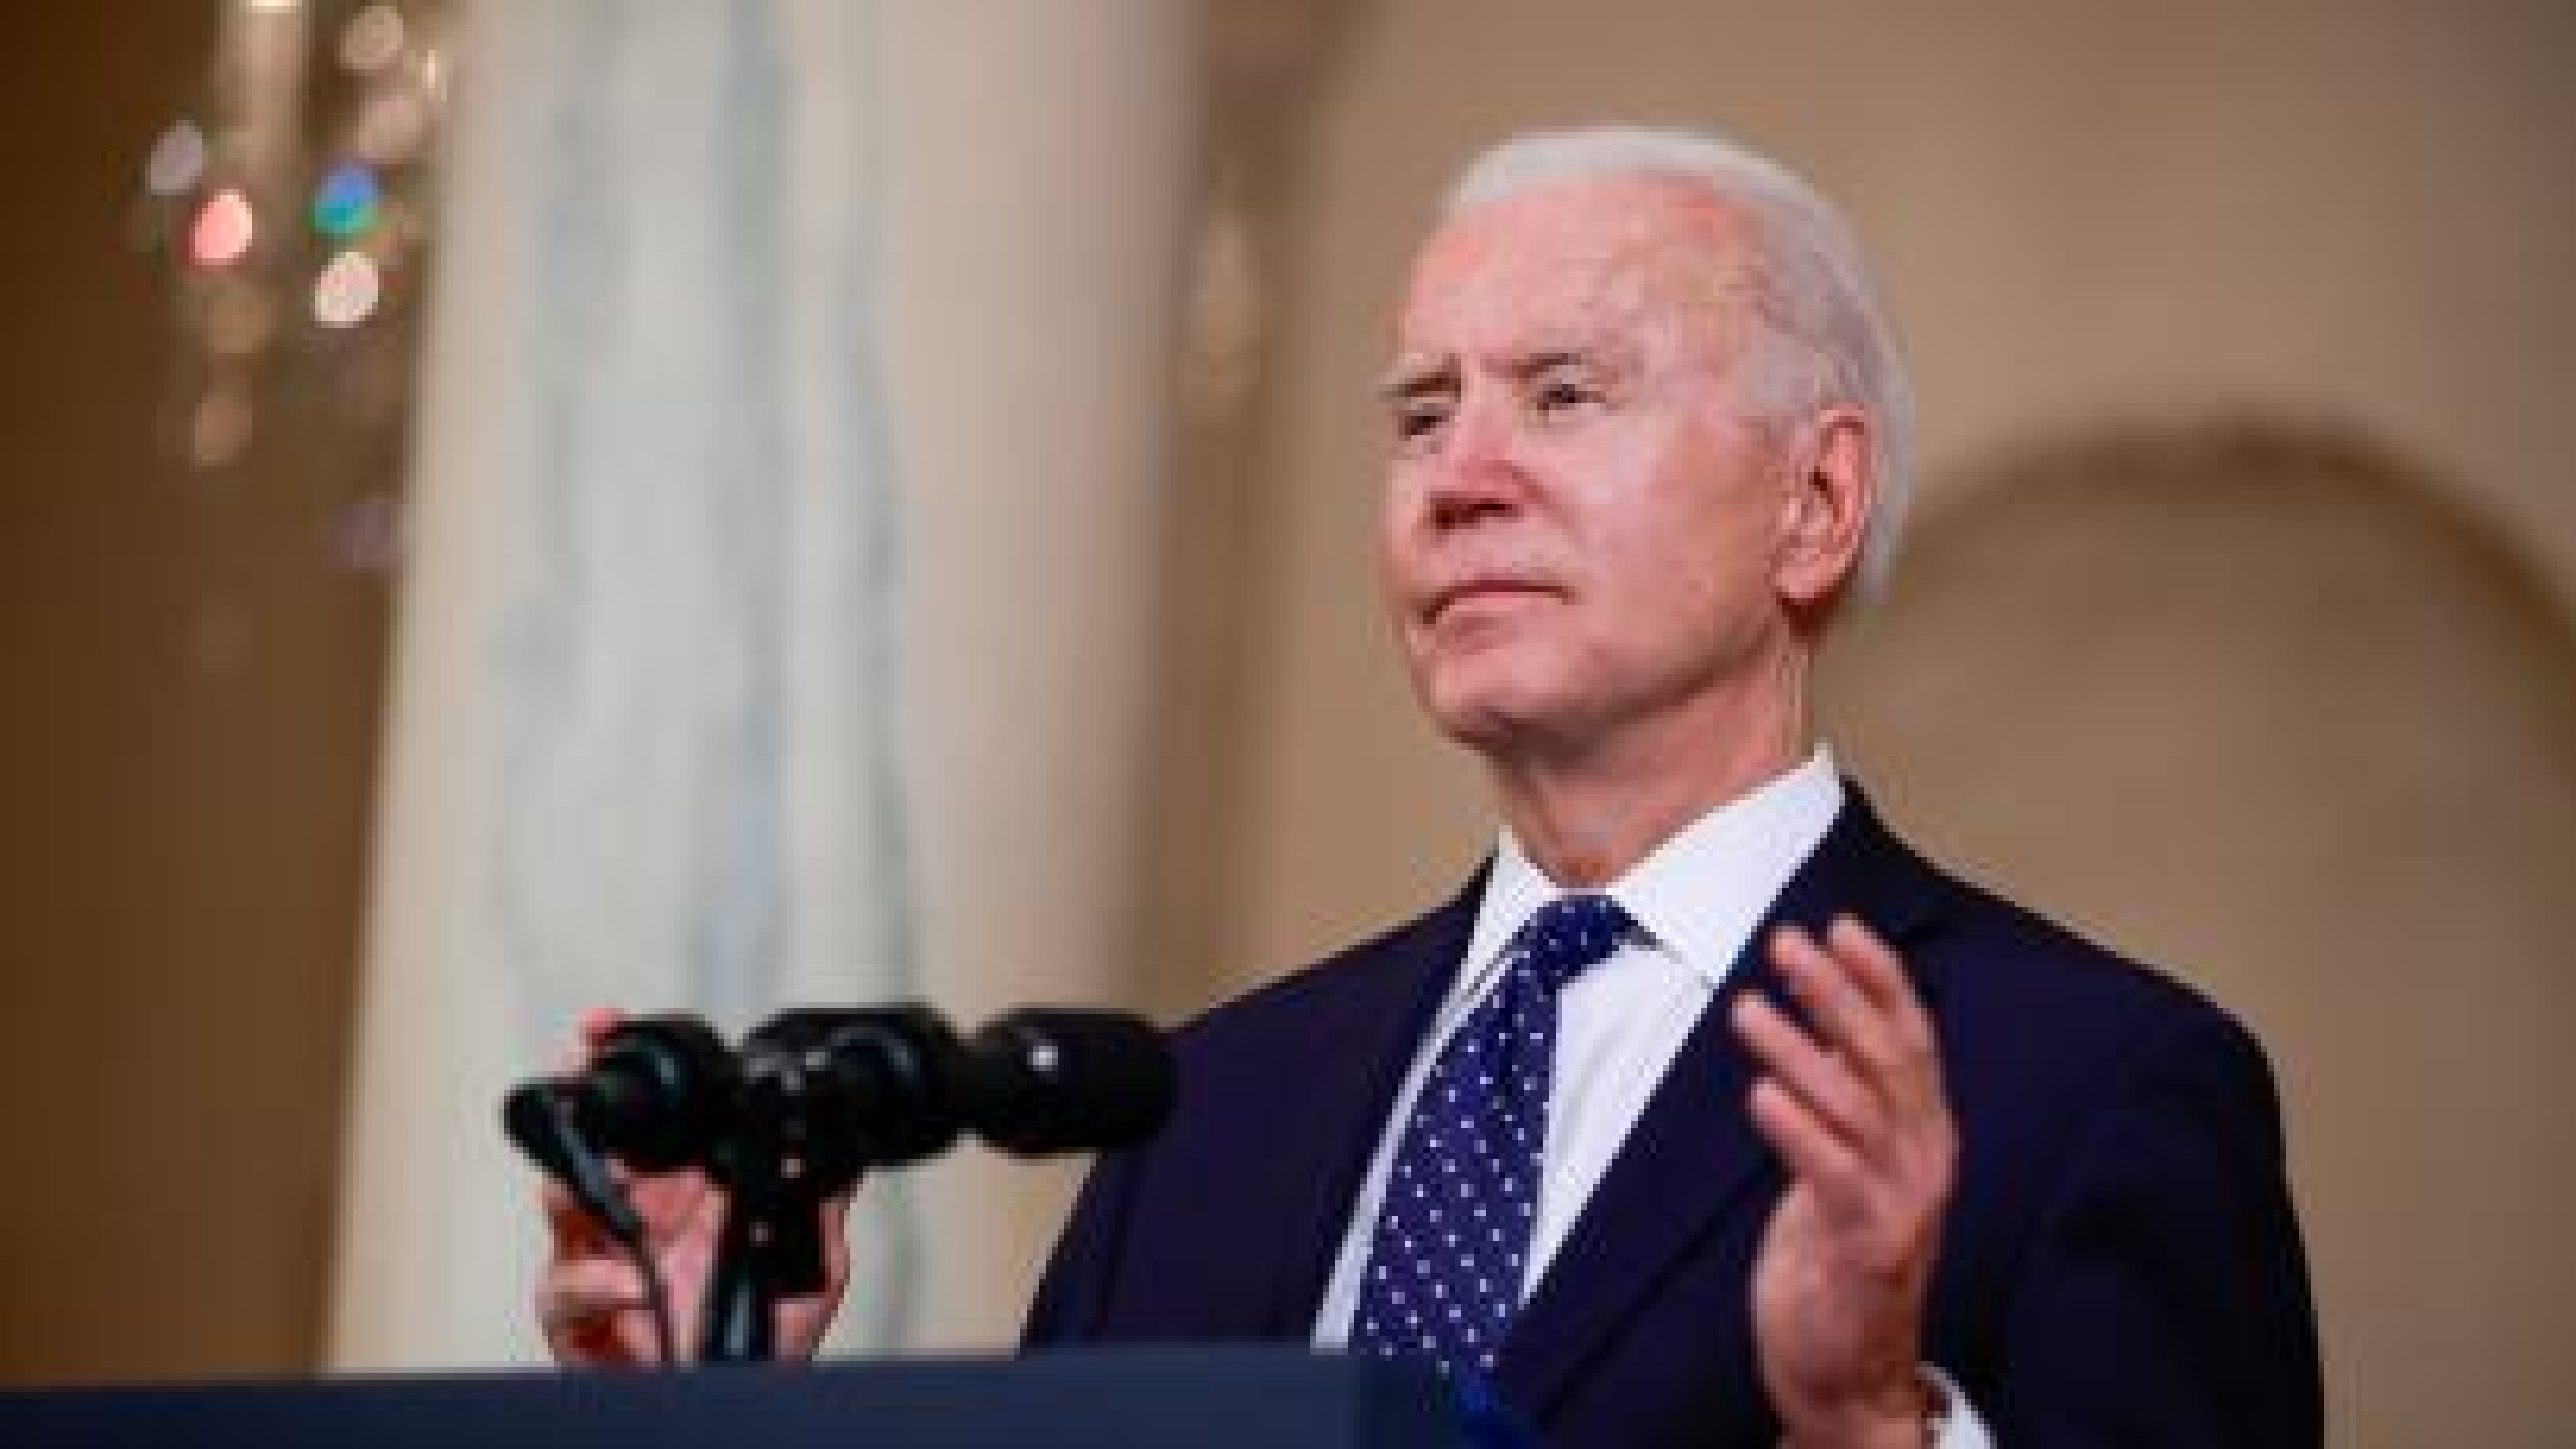 U.S. President Joe Biden speaks in the Cross Hall at the White House in Washington, U.S., April 20, 2021.